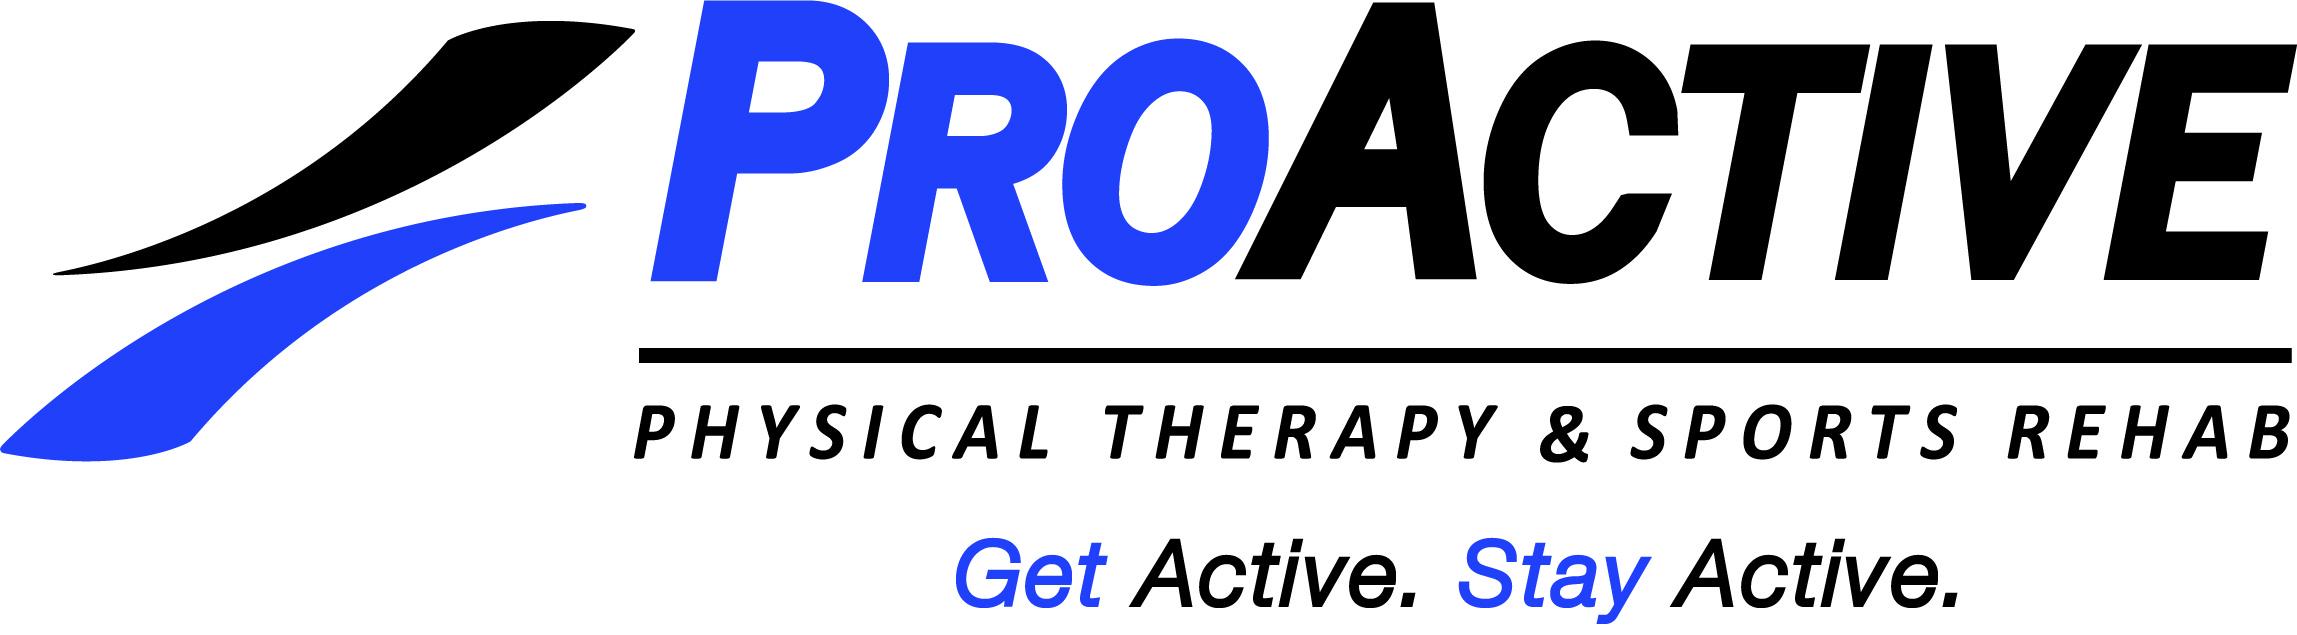 ProActive_Logo_WithTagline_061220_FINAL (1)